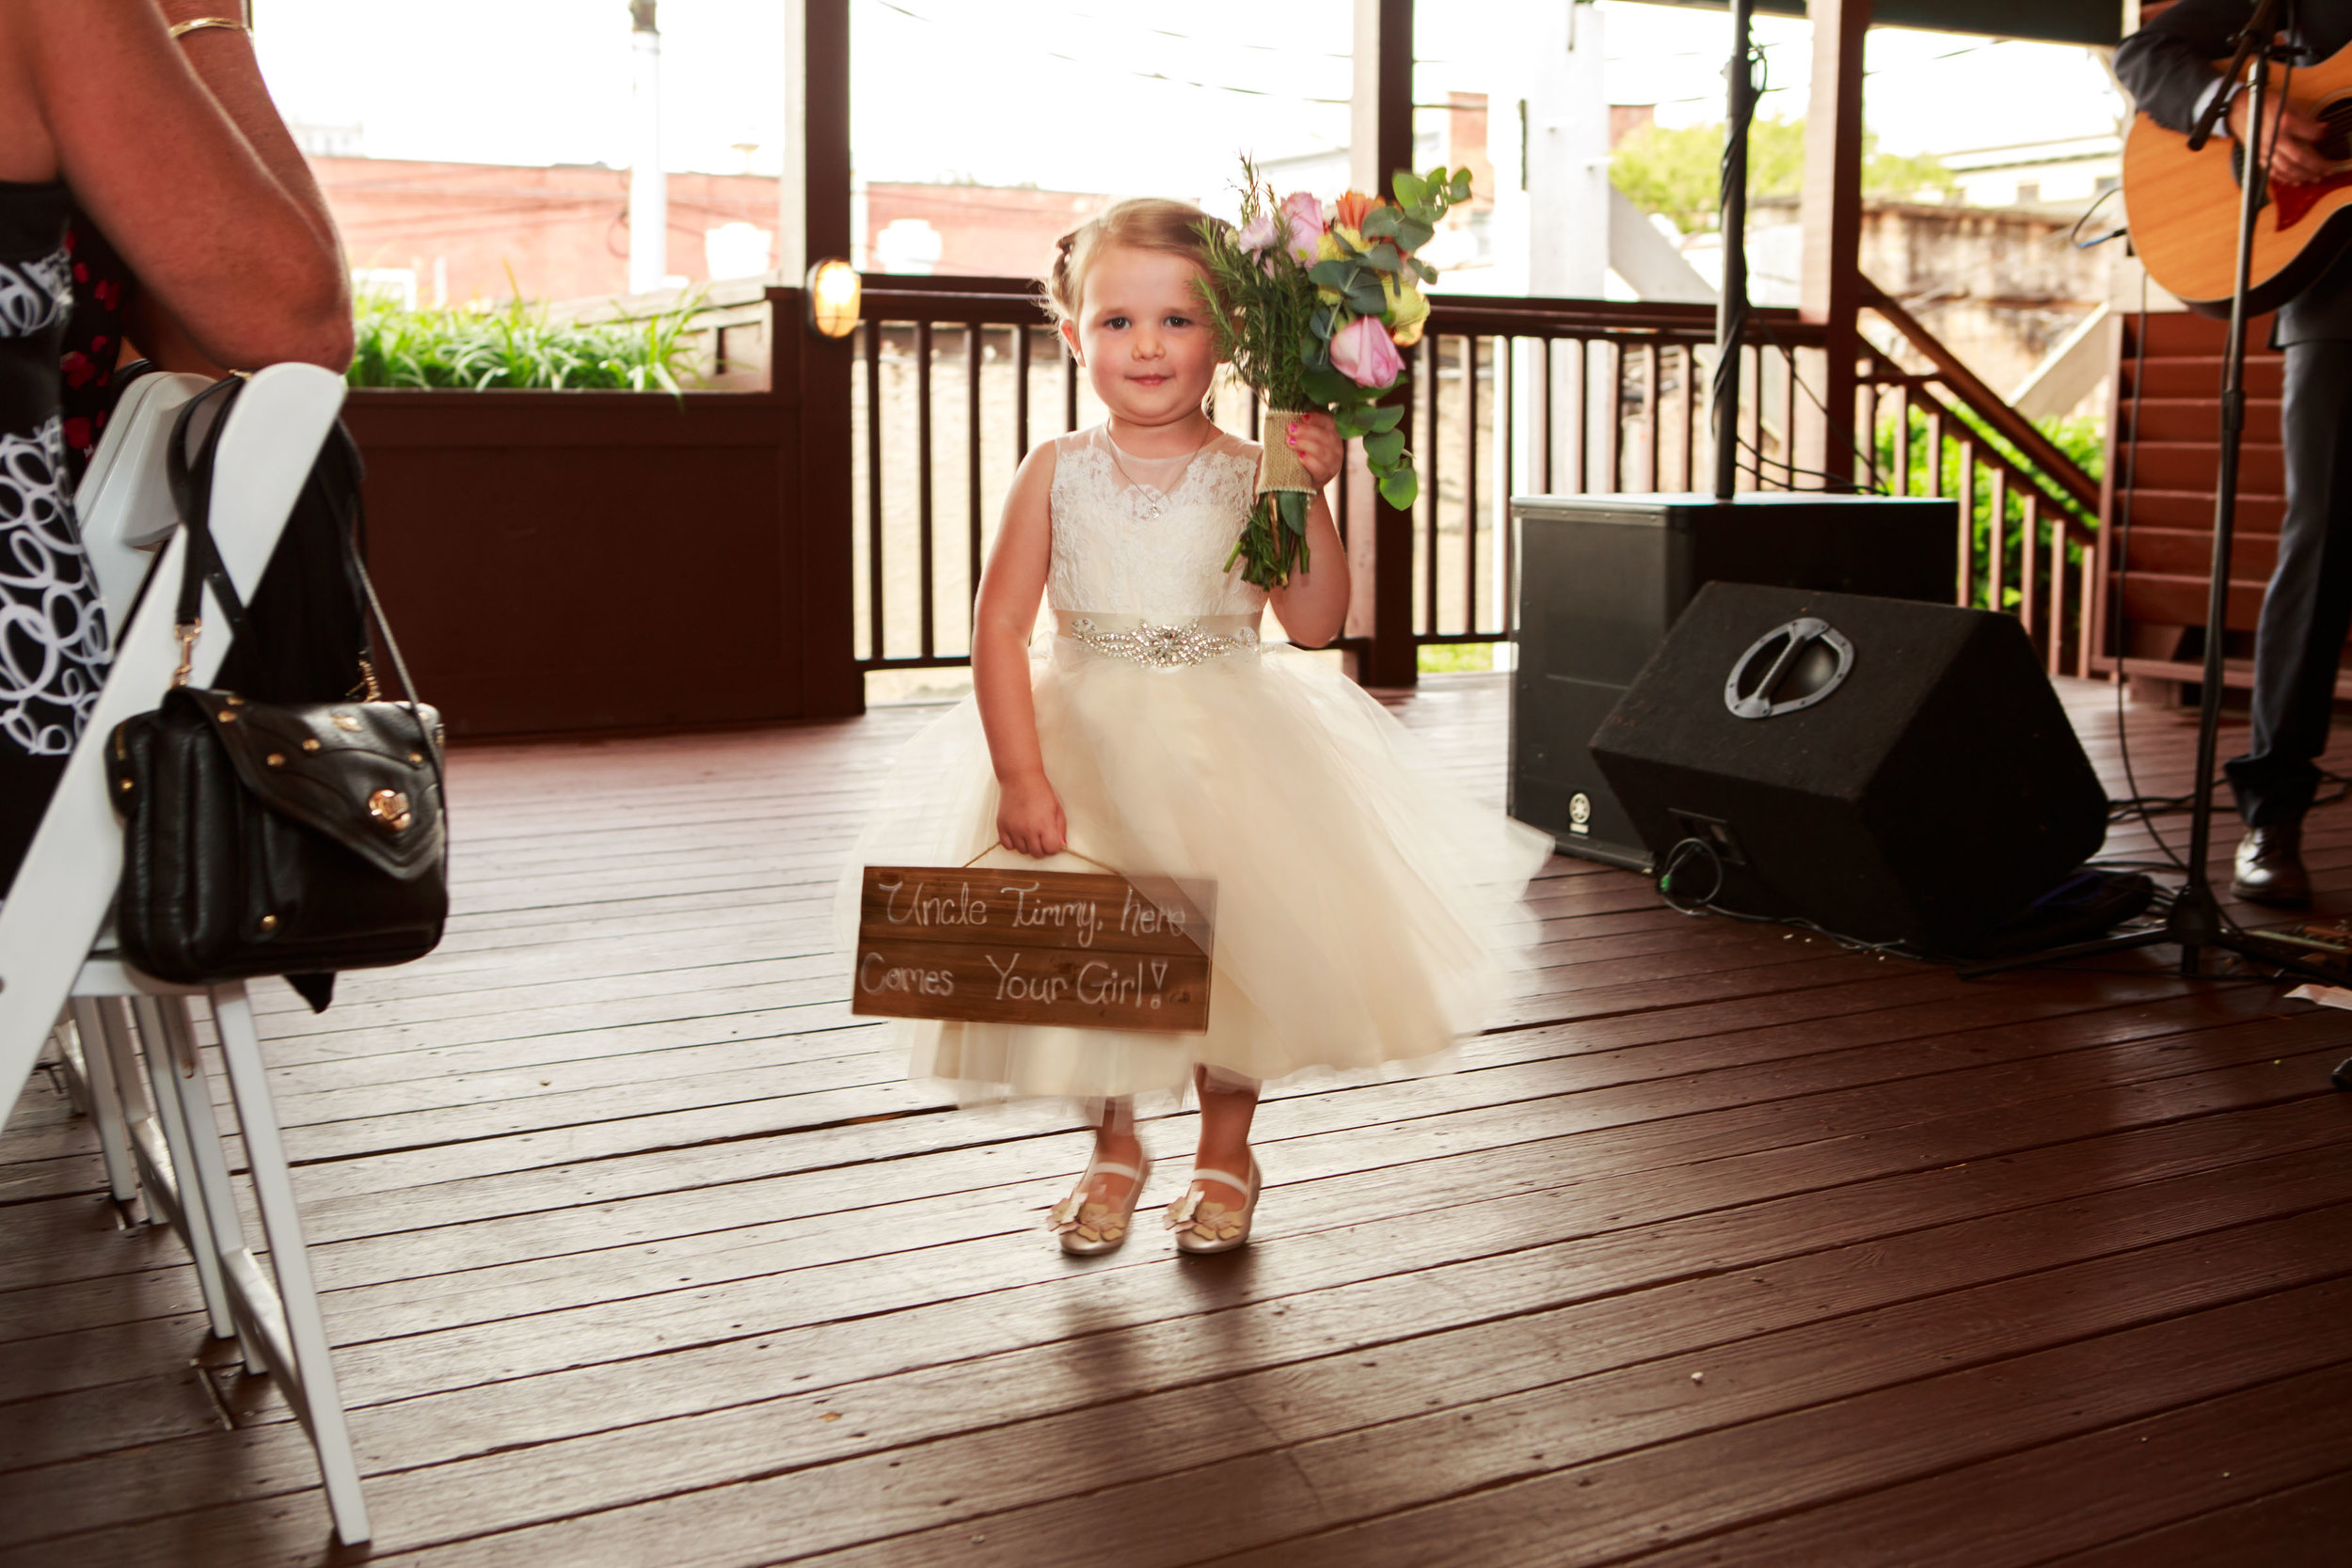 128-South-Wedding-Wilmington-NC-Photographer-Ceremony-09.jpg